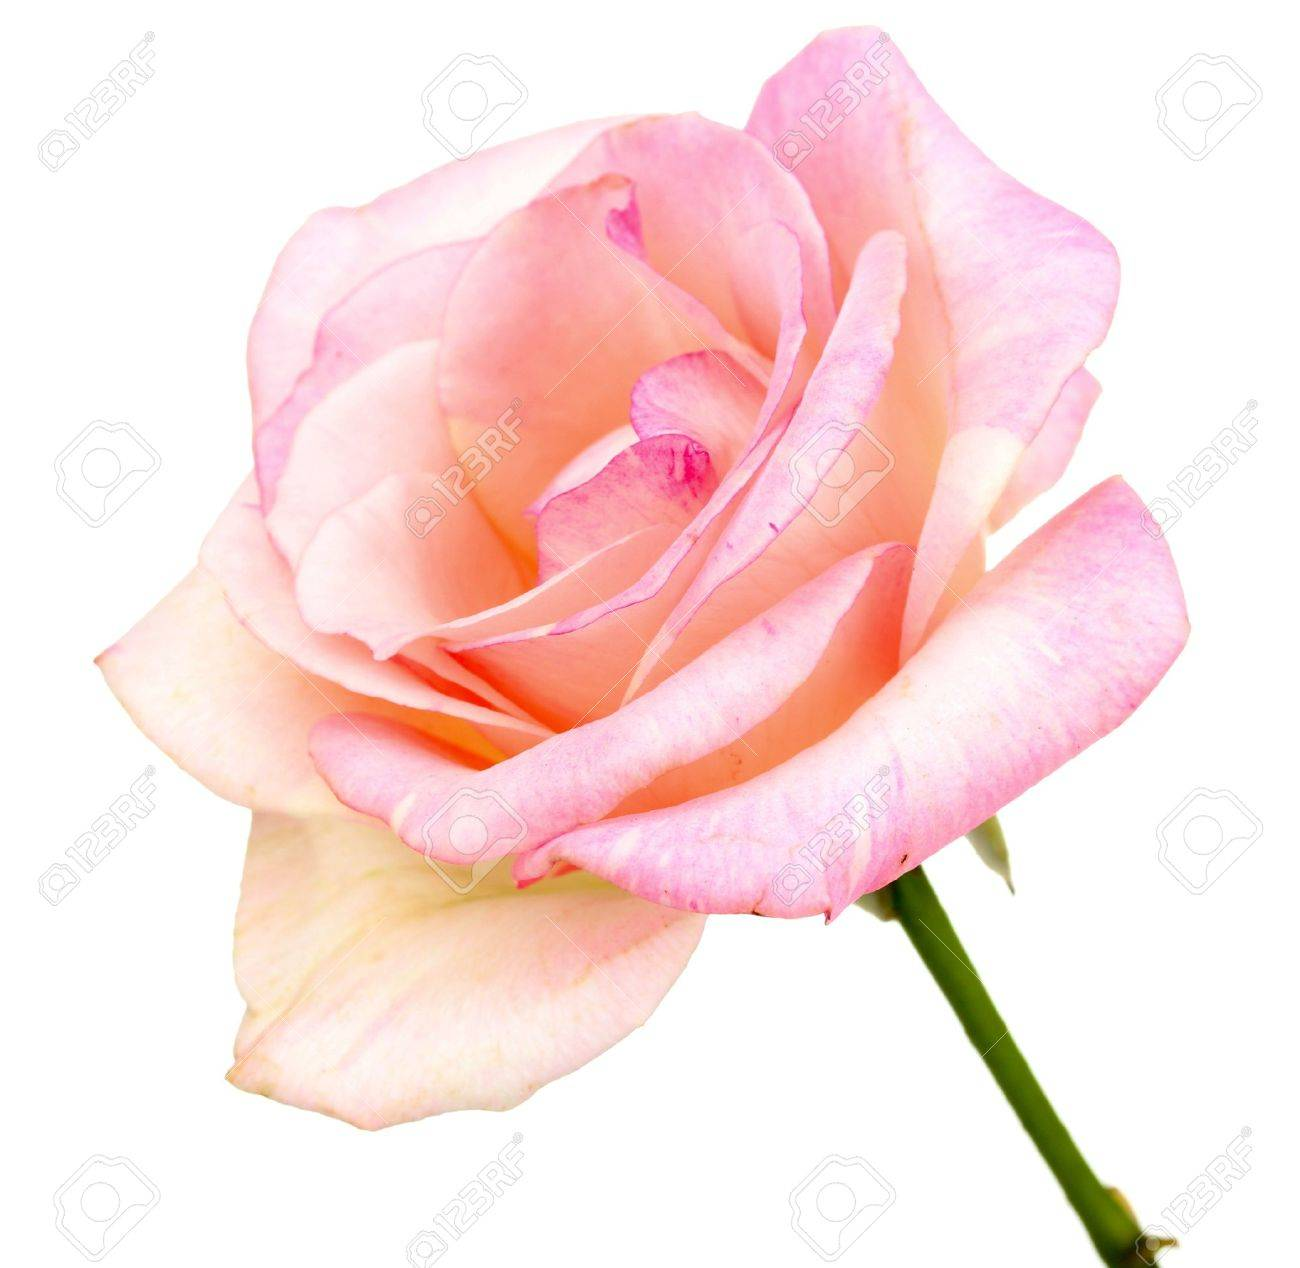 Beautiful pink rose isolated on white Stock Photo - 10751837